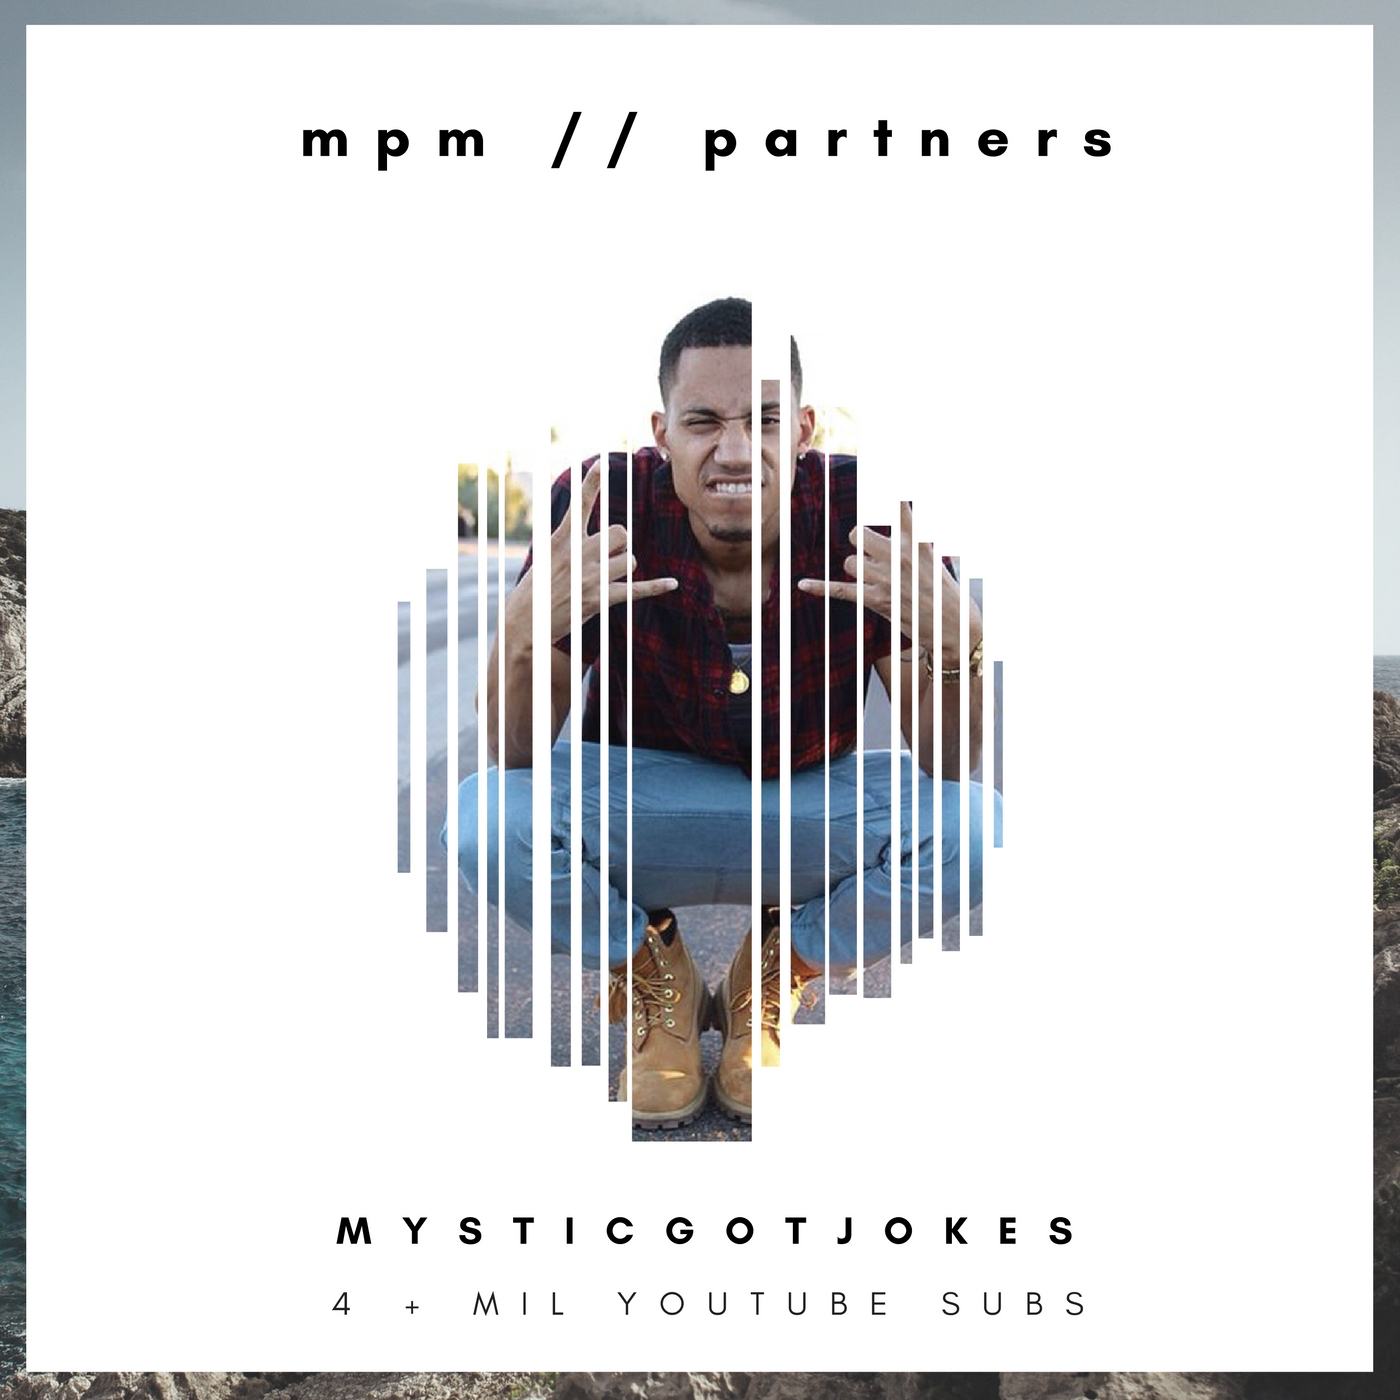 MysticGotJokes